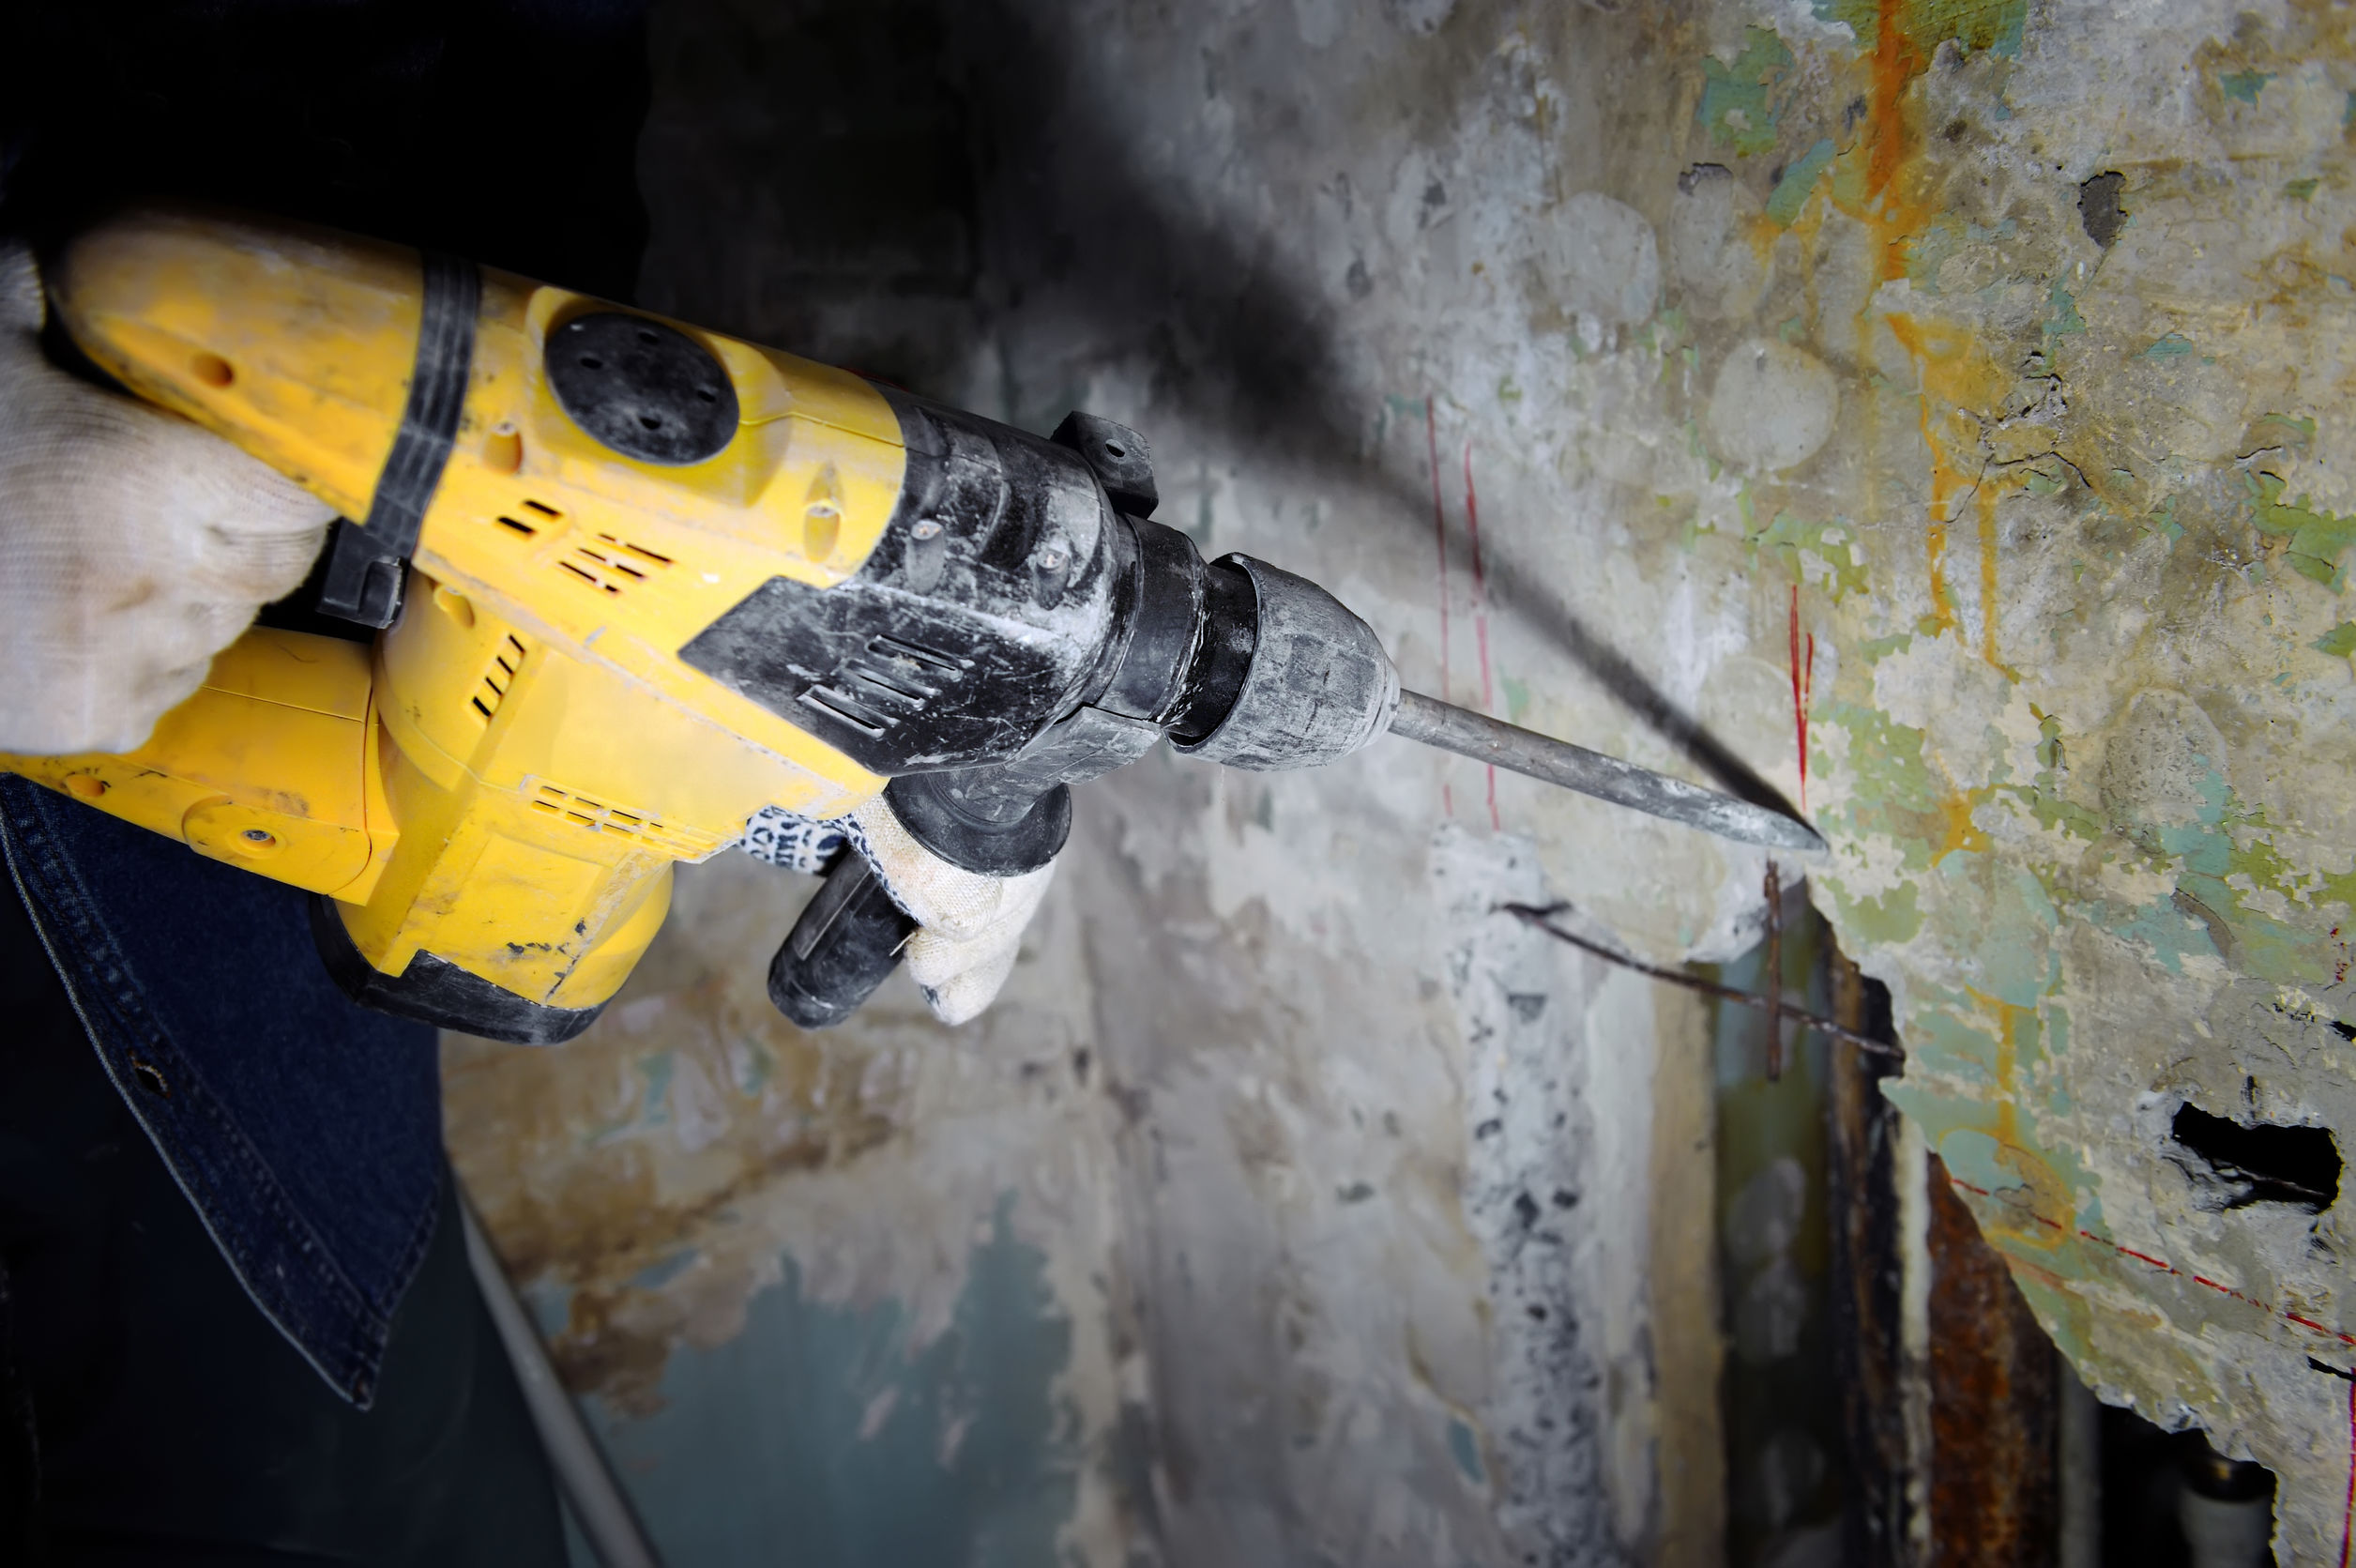 akku-bohrhammer-test